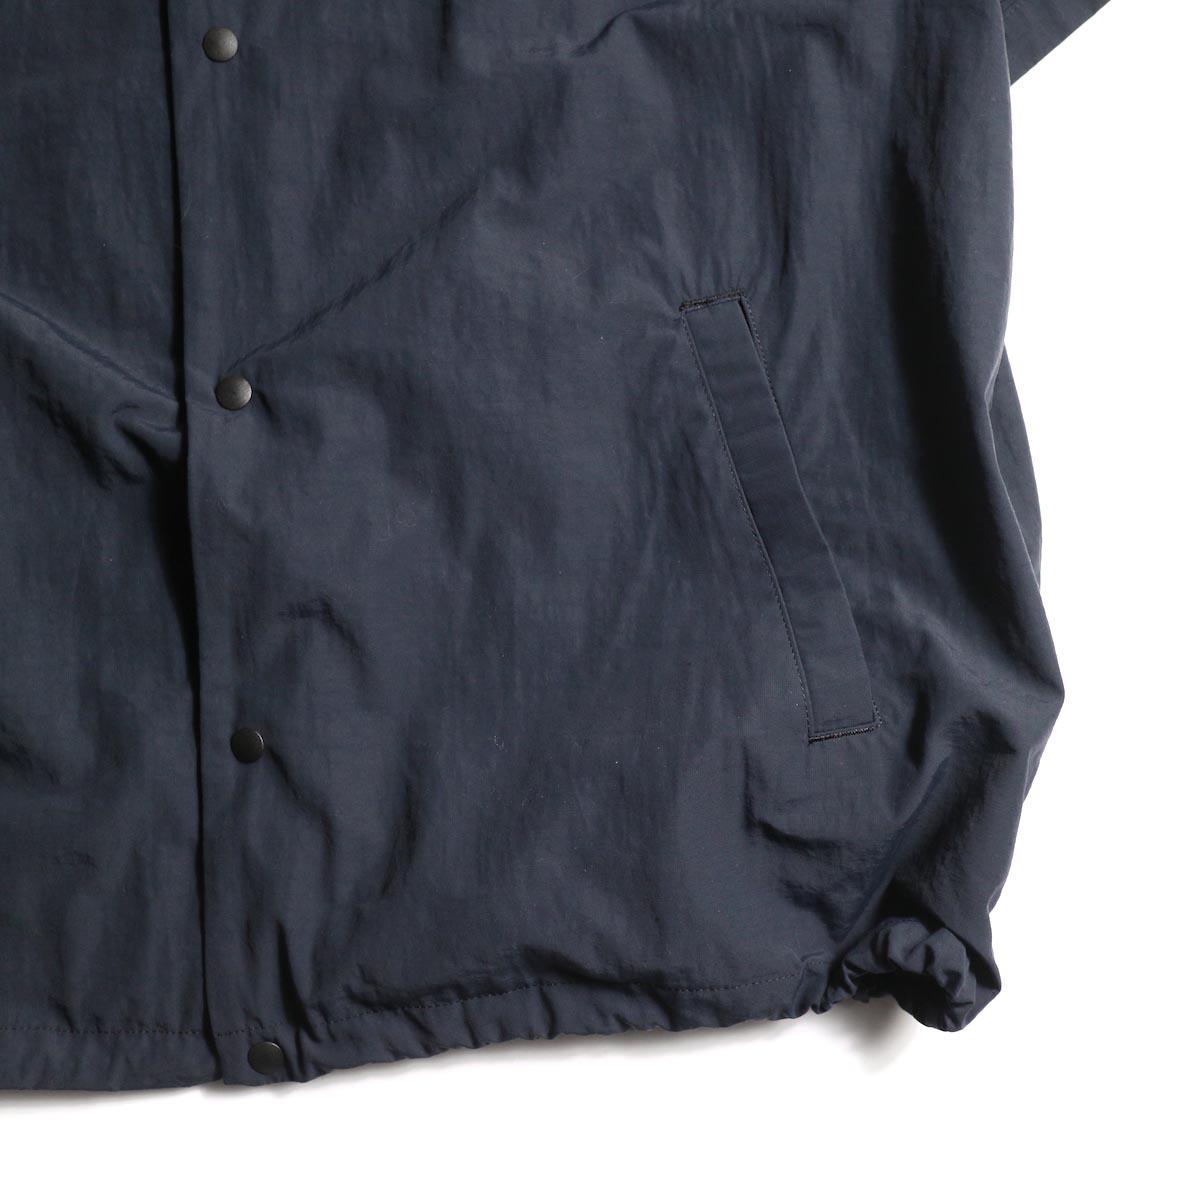 DESCENTE ddd / COACH SHIRT (Black)裾、ポケット